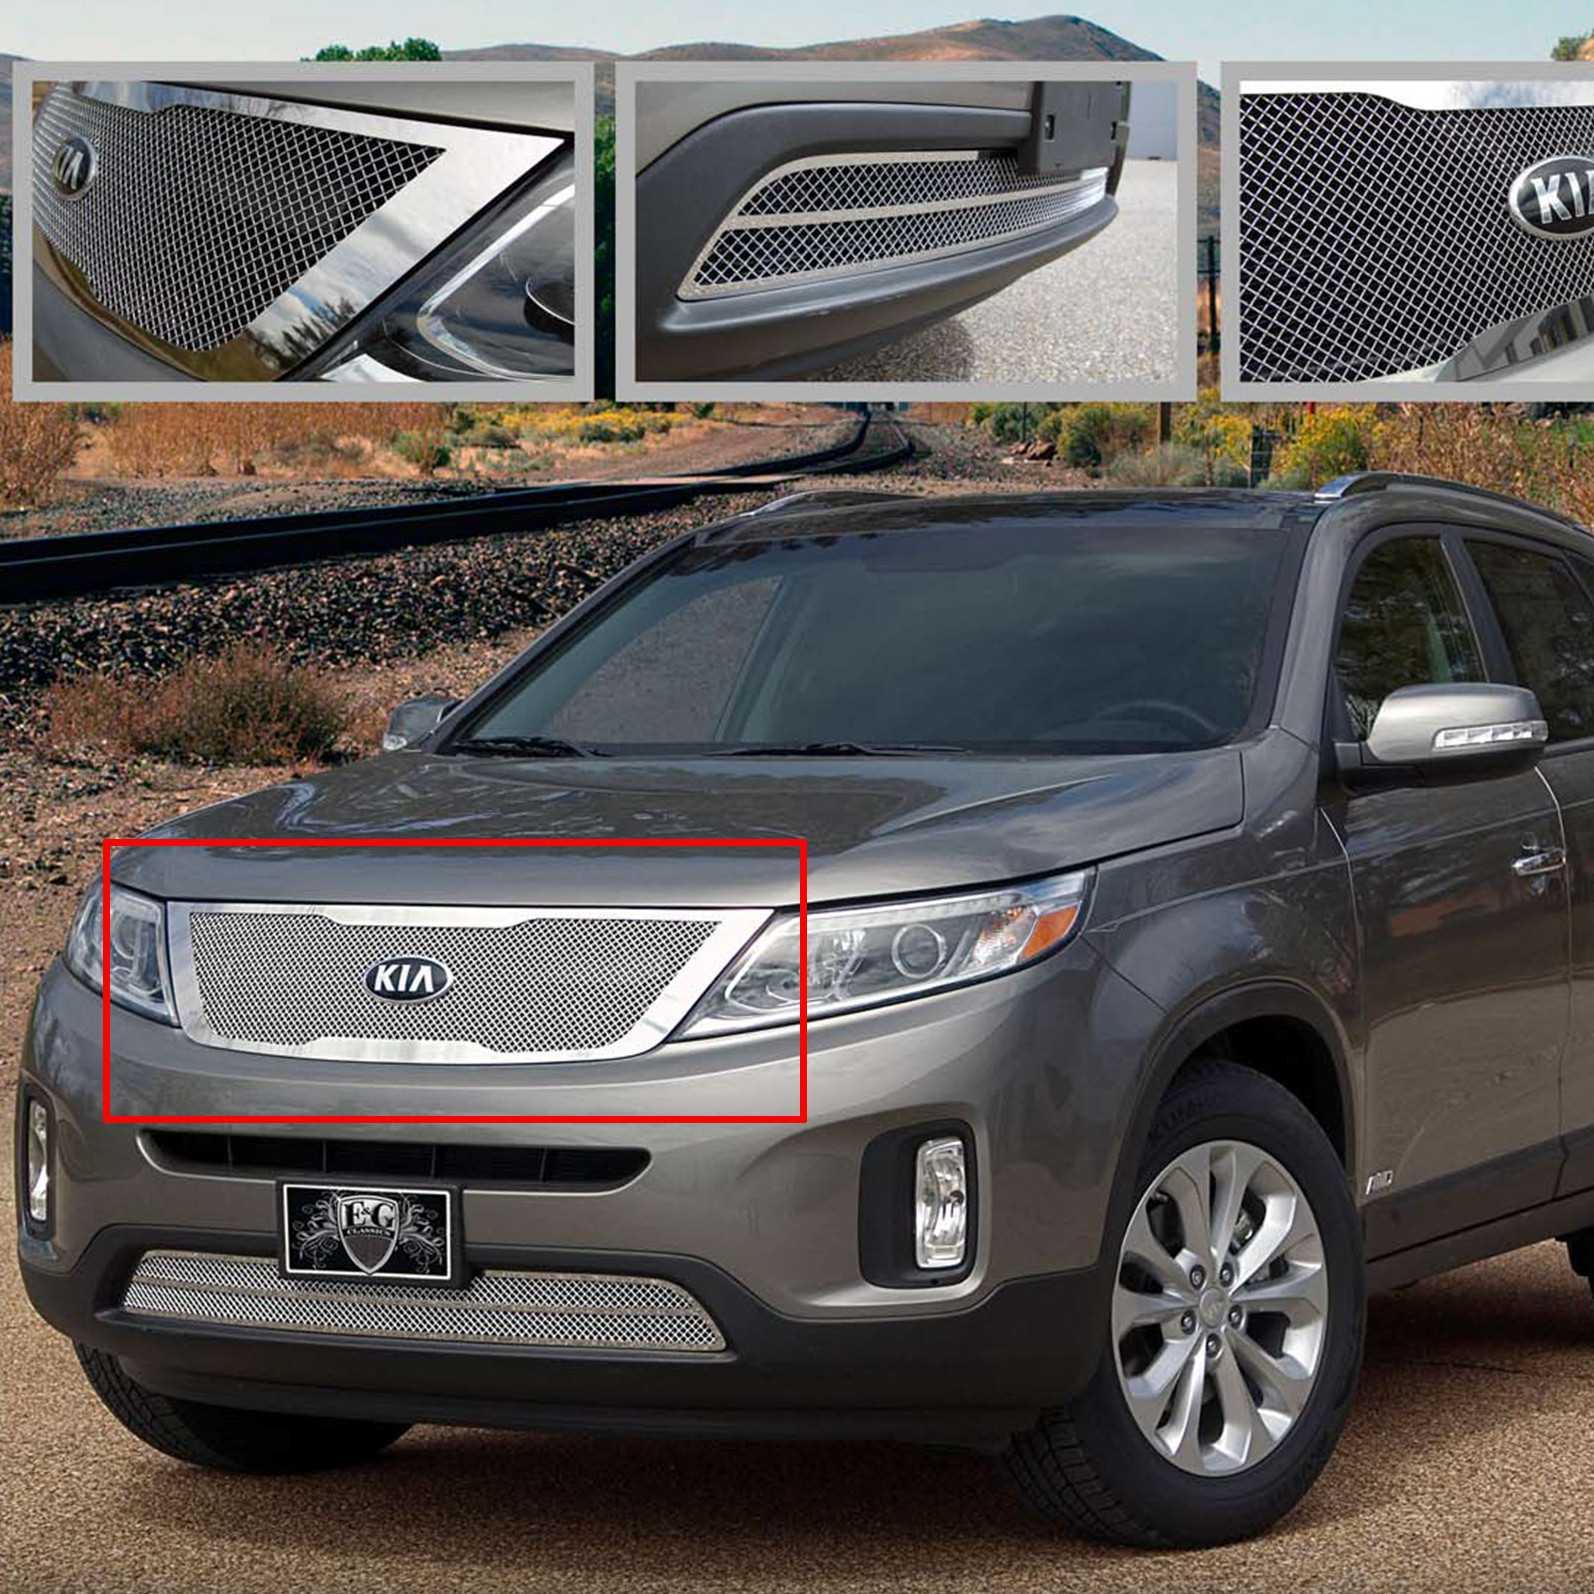 2013 Kia Sportage Ex: Custom Grills For Your Car, Truck, Jeep